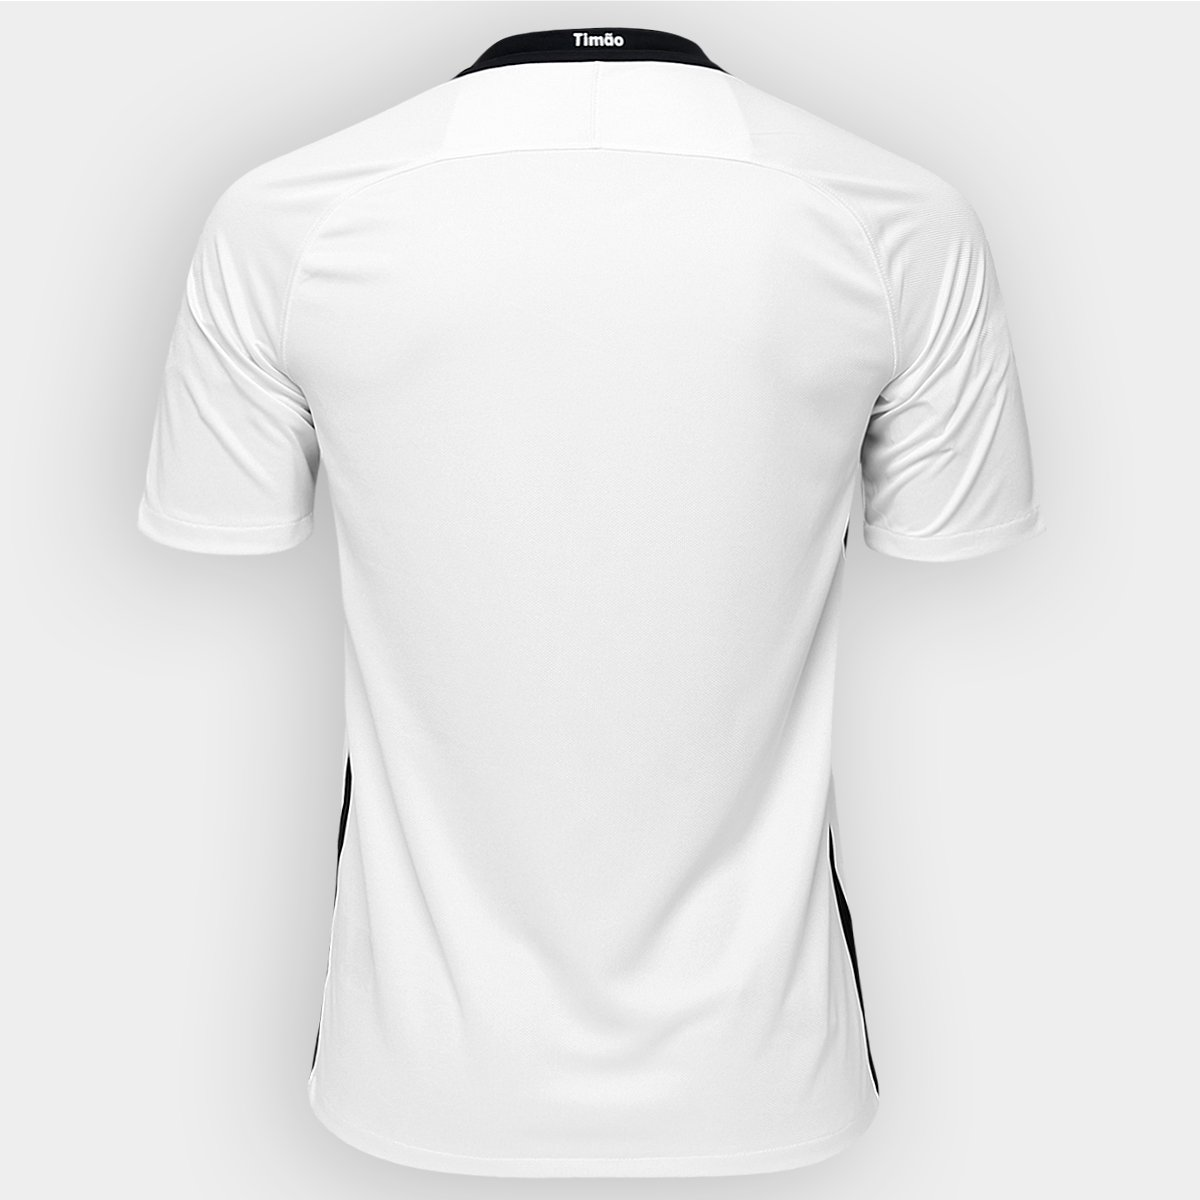 Camisa Corinthians I 2016 s nº Torcedor Nike Masculina - Compre ... 850a09fb58800